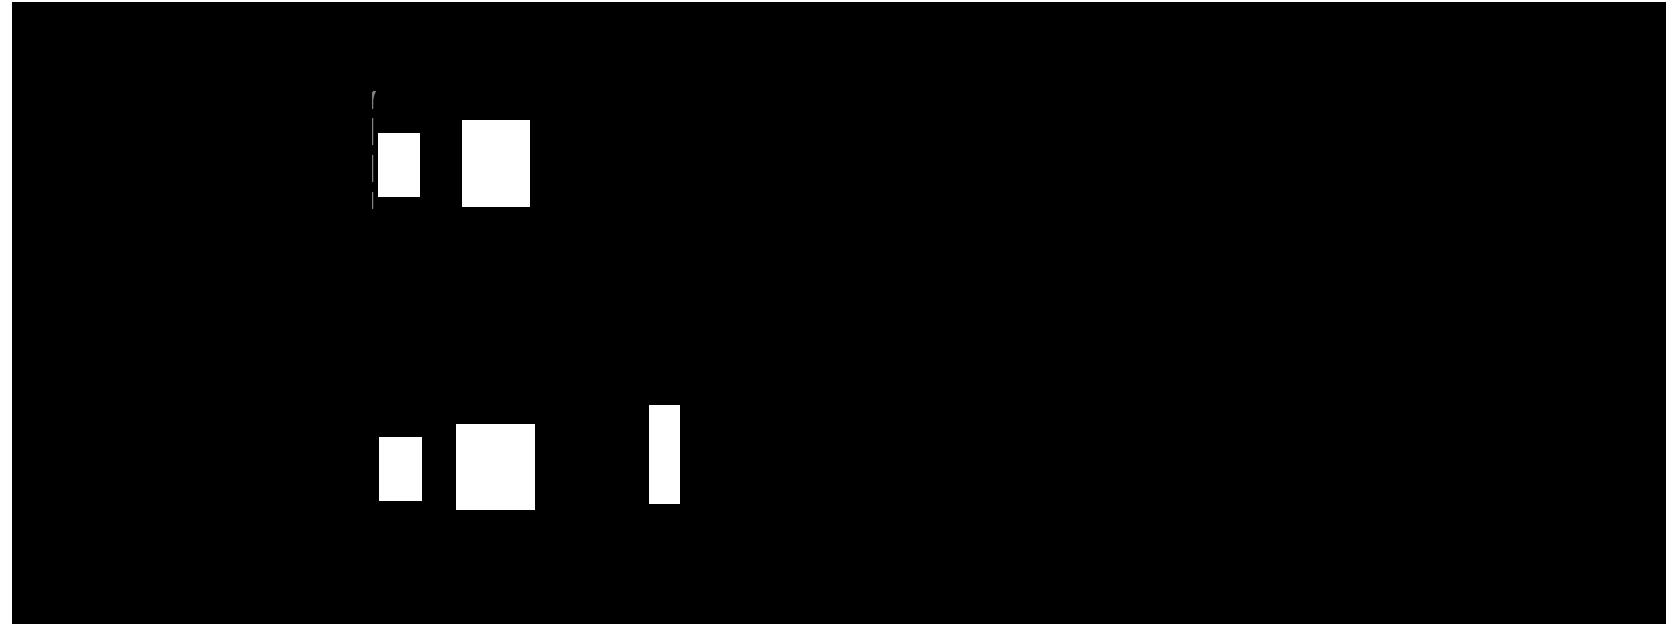 Line Drawing of the Tiller — 17' DC